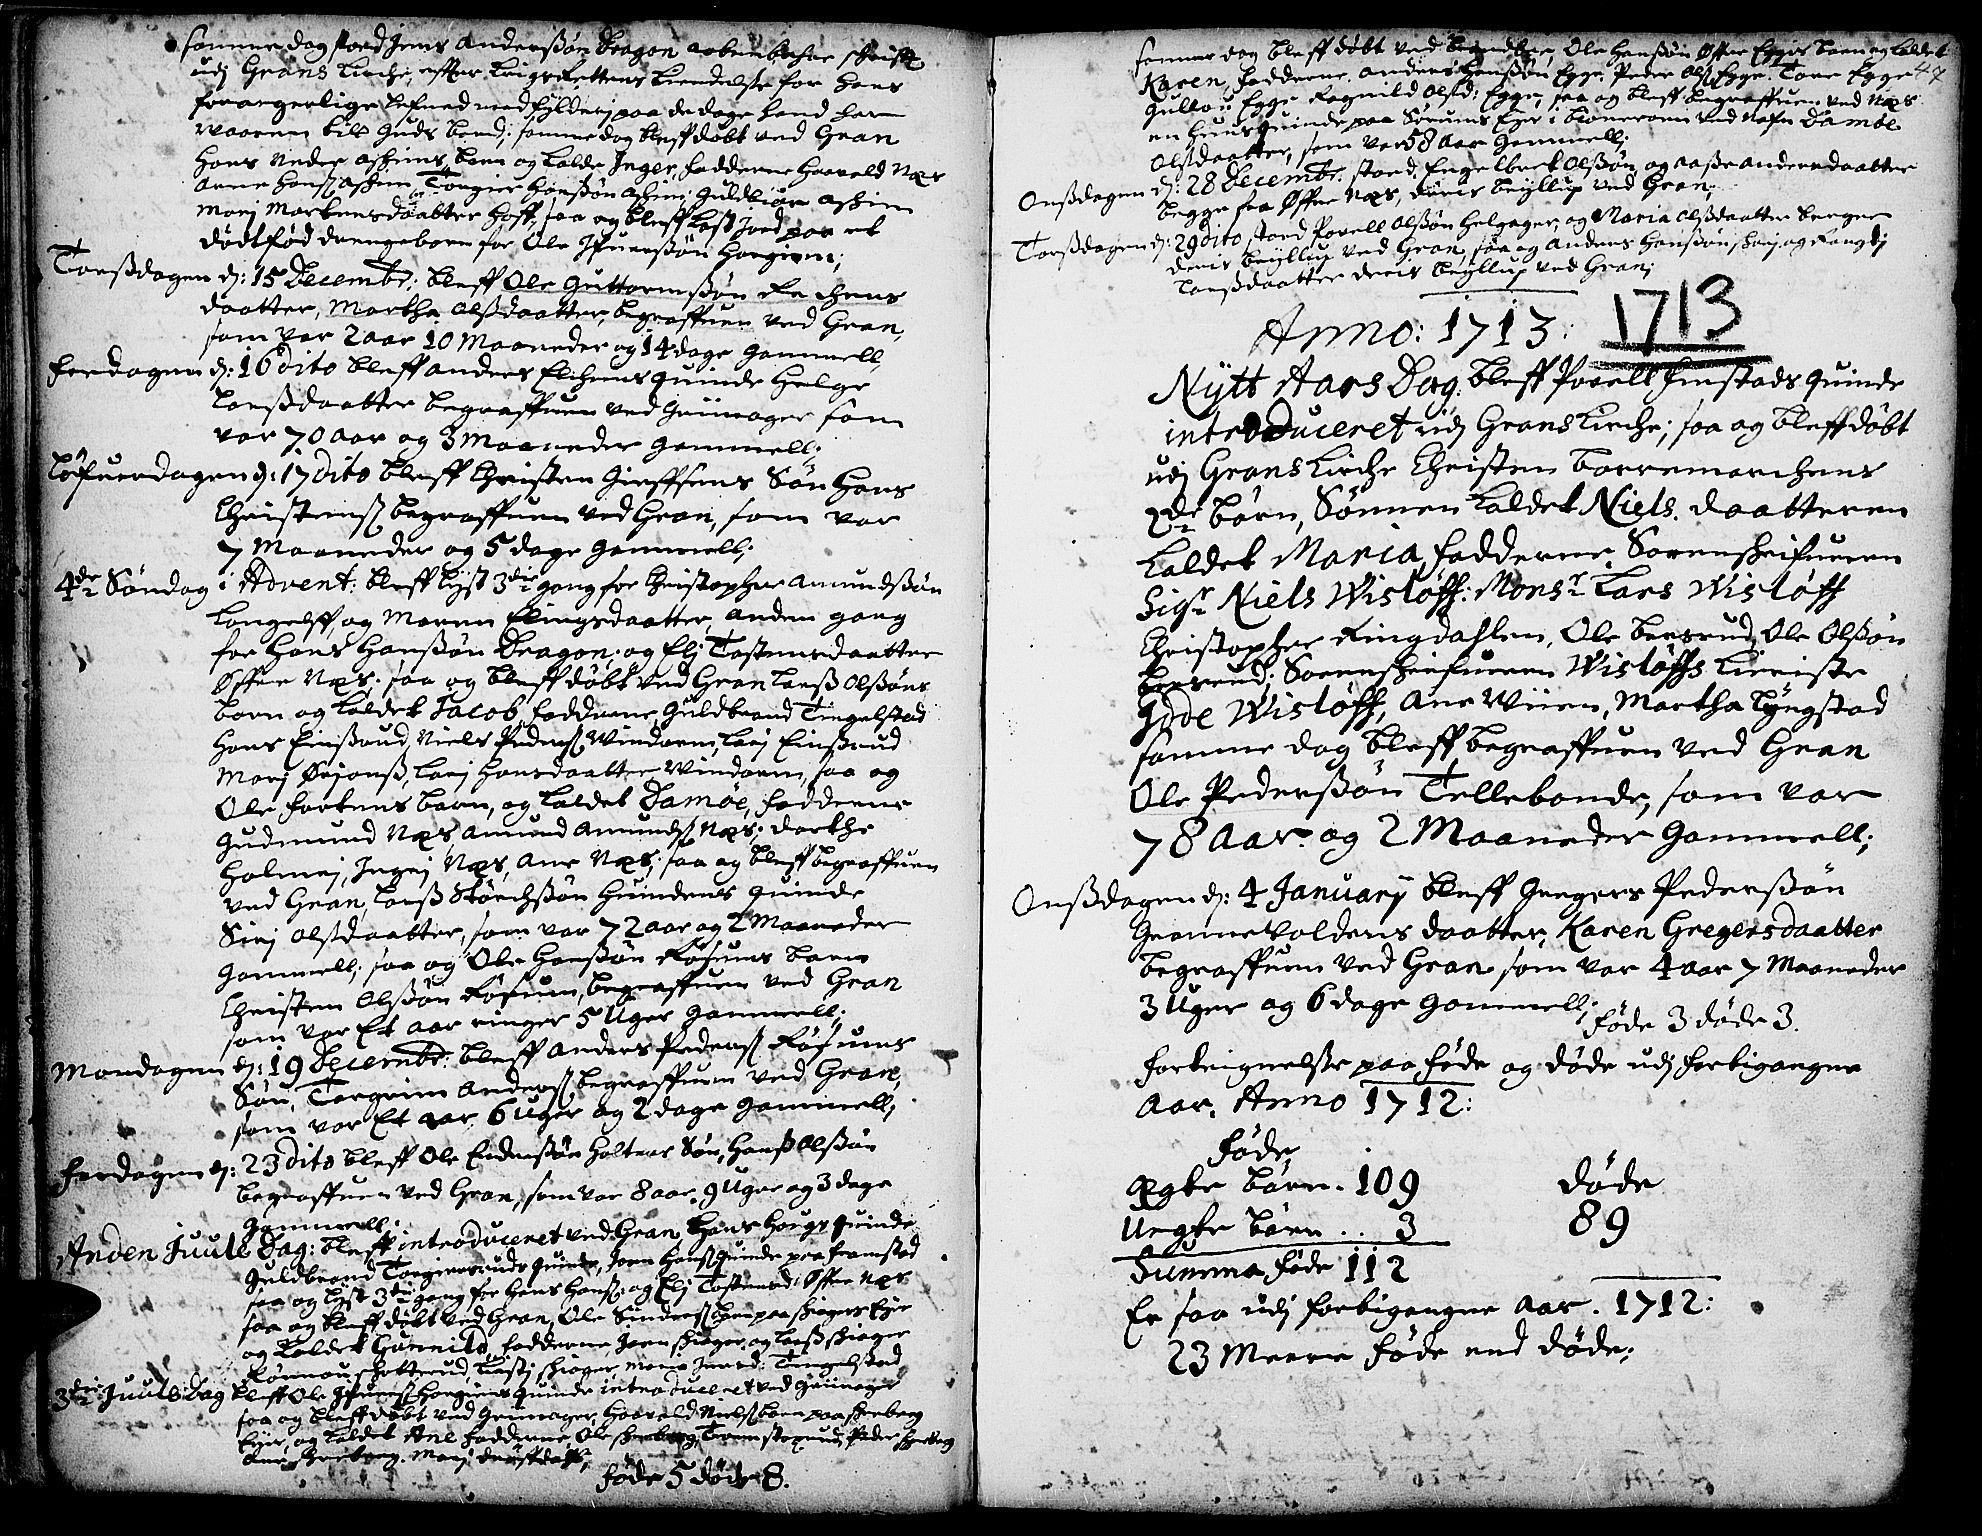 SAH, Gran prestekontor, Ministerialbok nr. 1, 1707-1731, s. 47